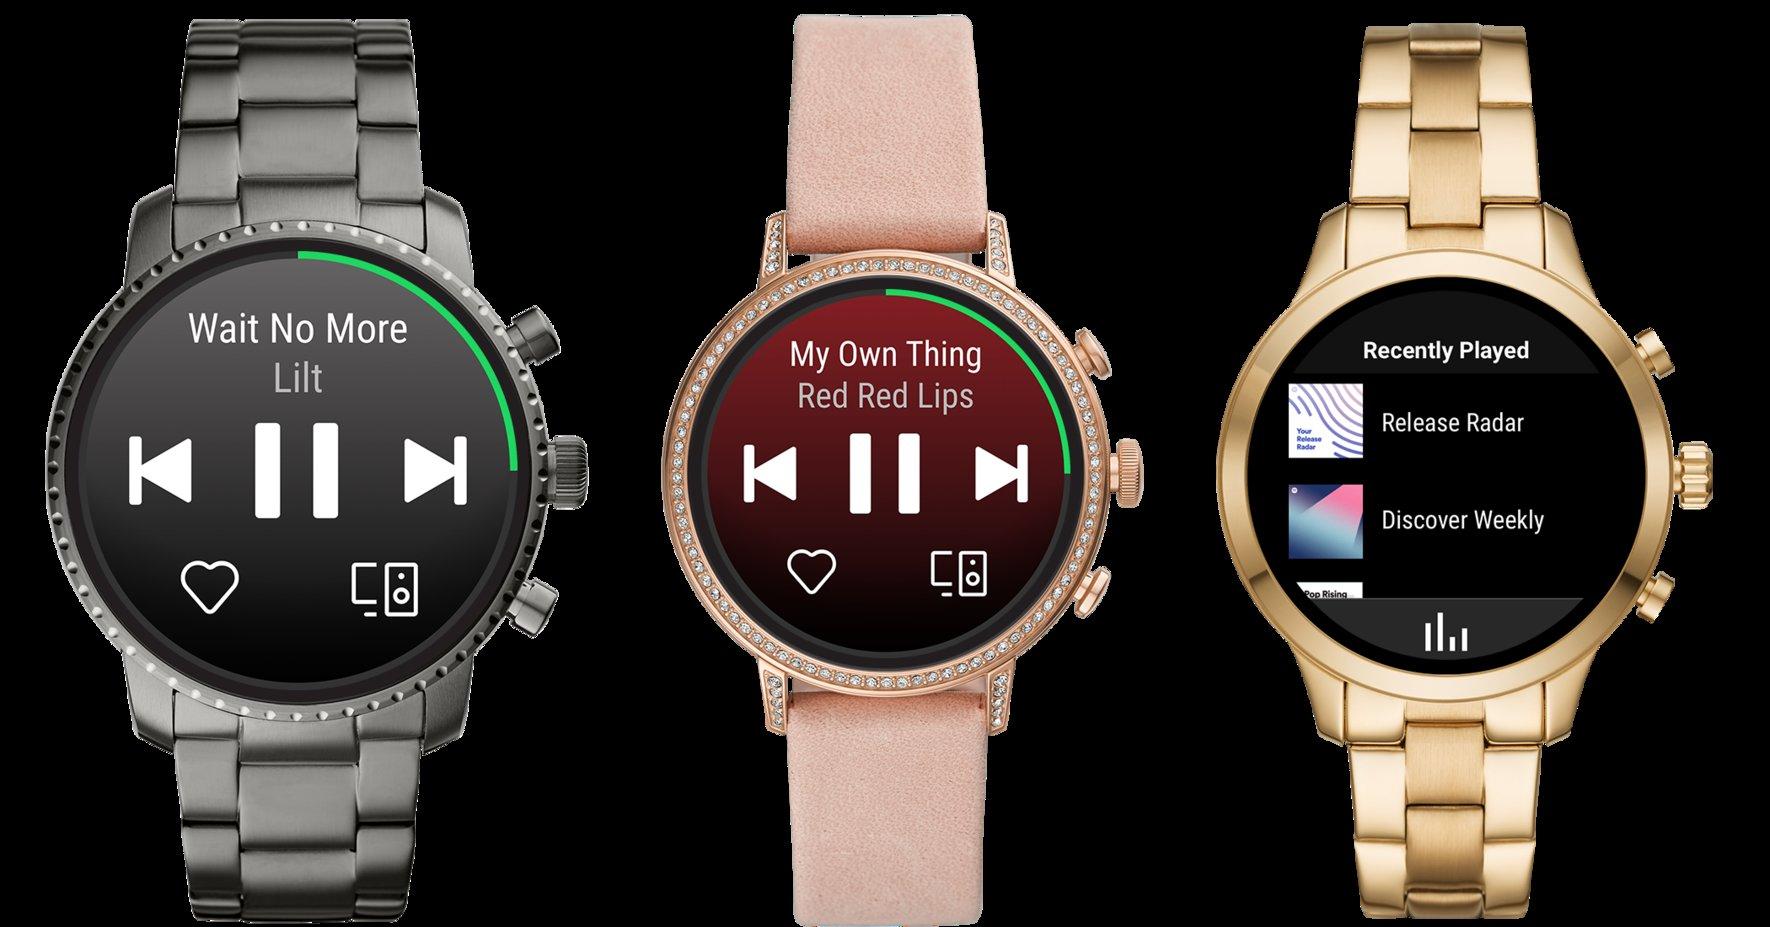 New Spotify app for Wear OS